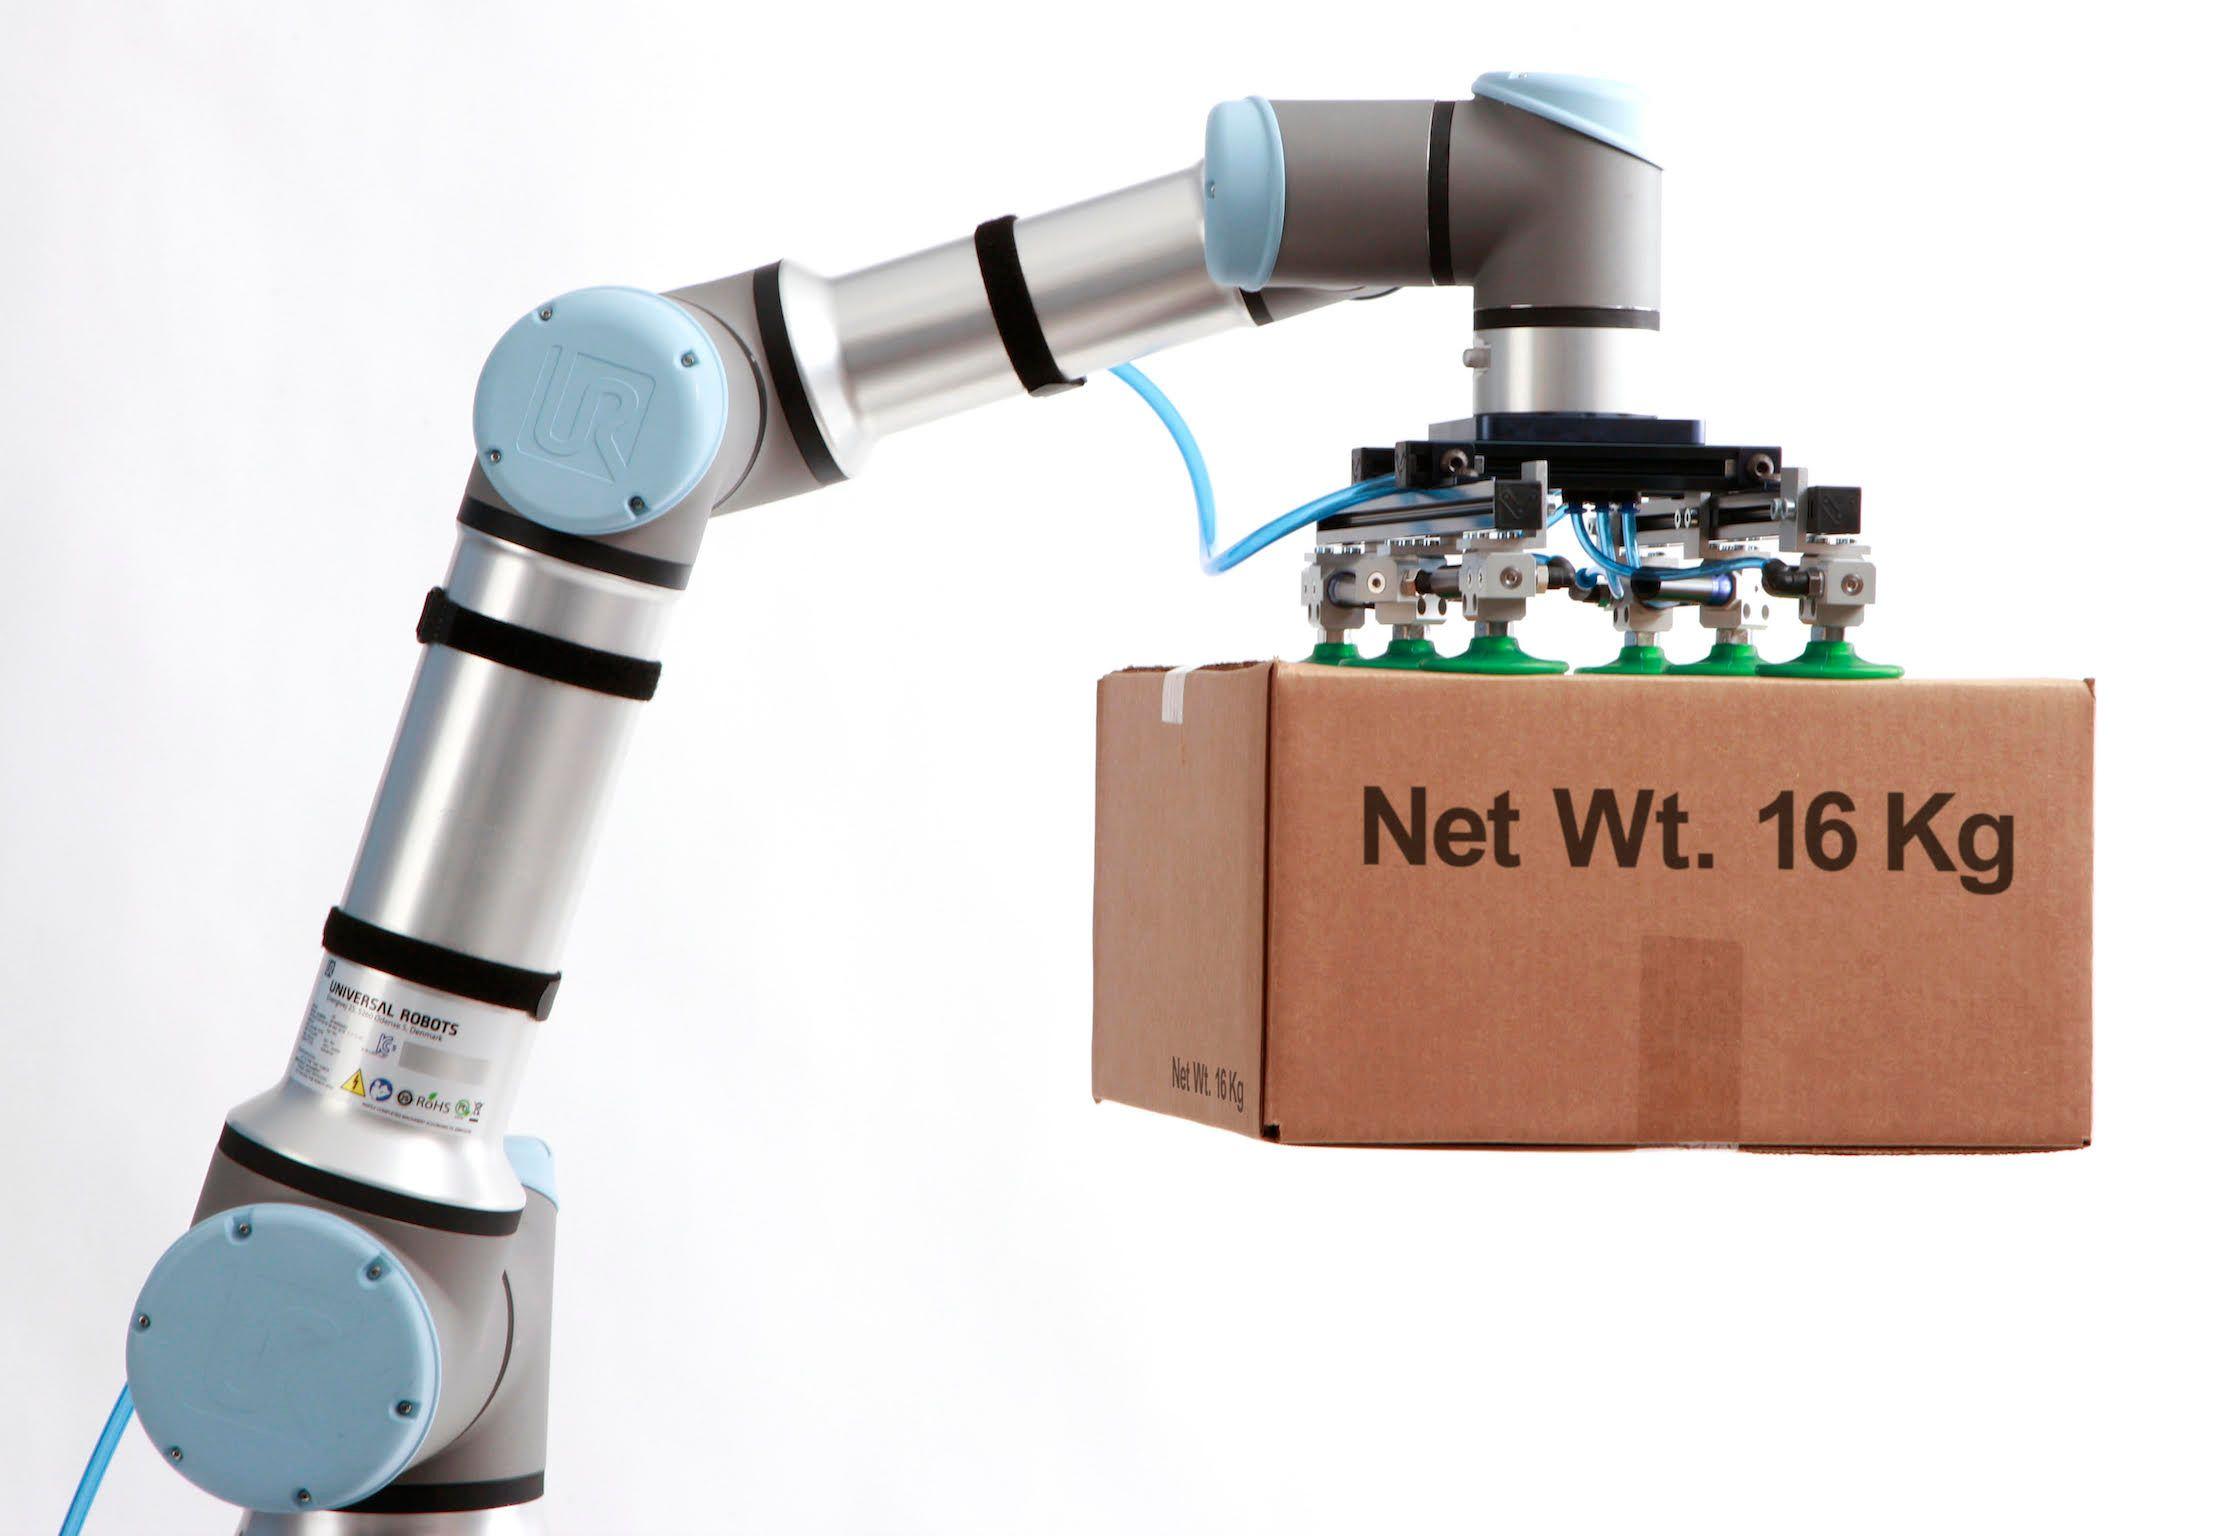 UR16e robot arm from Universal Robots